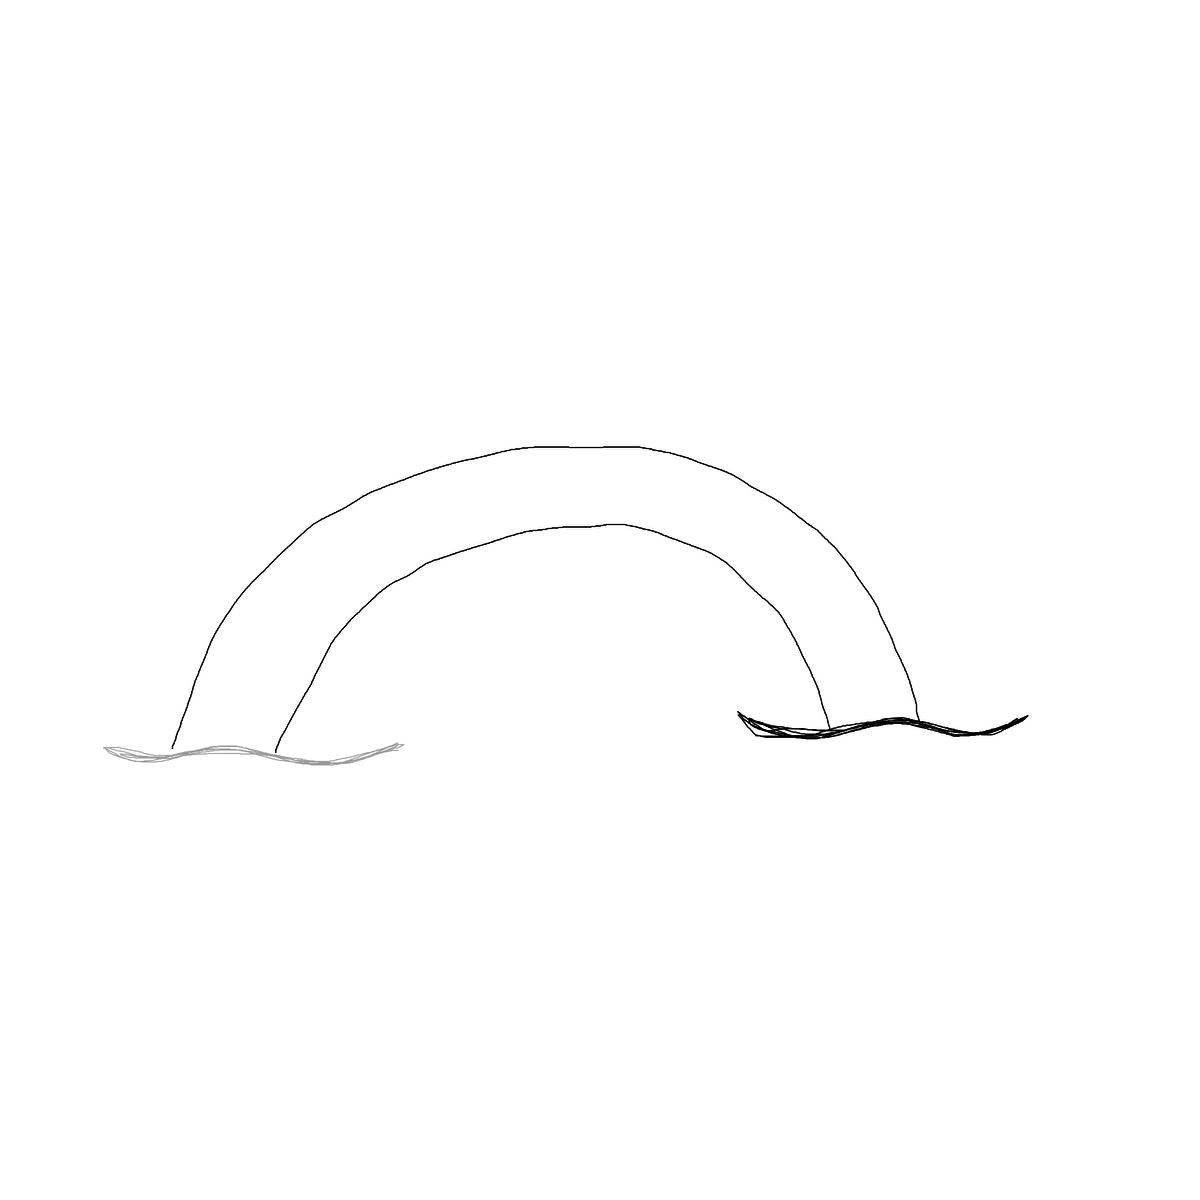 BAAAM drawing#2250 lat:43.4005317687988300lng: -1.7704950571060180